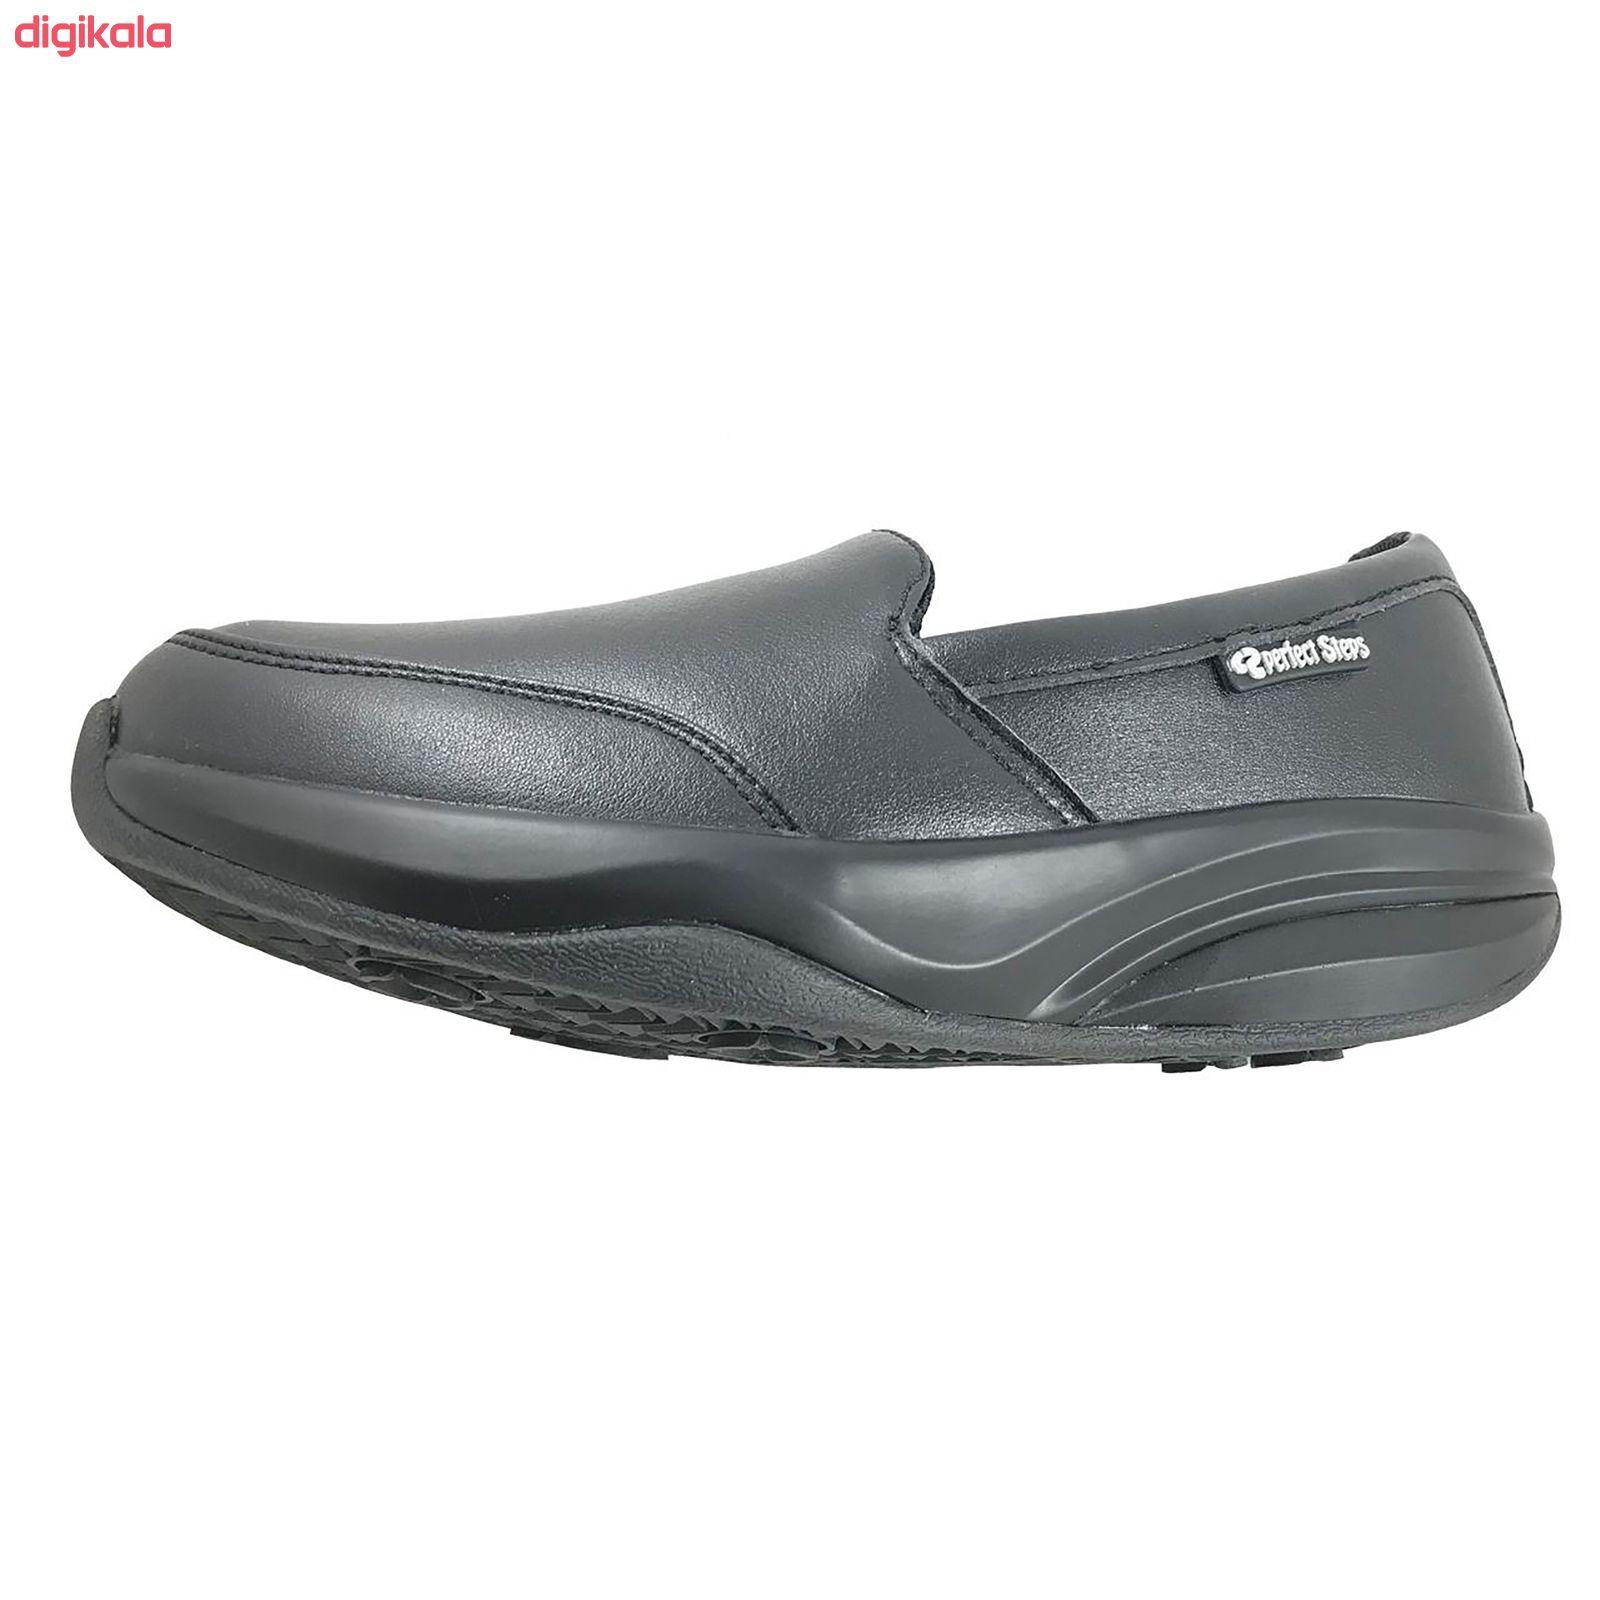 کفش مخصوص پیاده روی زنانه پرفکت استپس مدل پریمو کژوال رنگ مشکی main 1 1